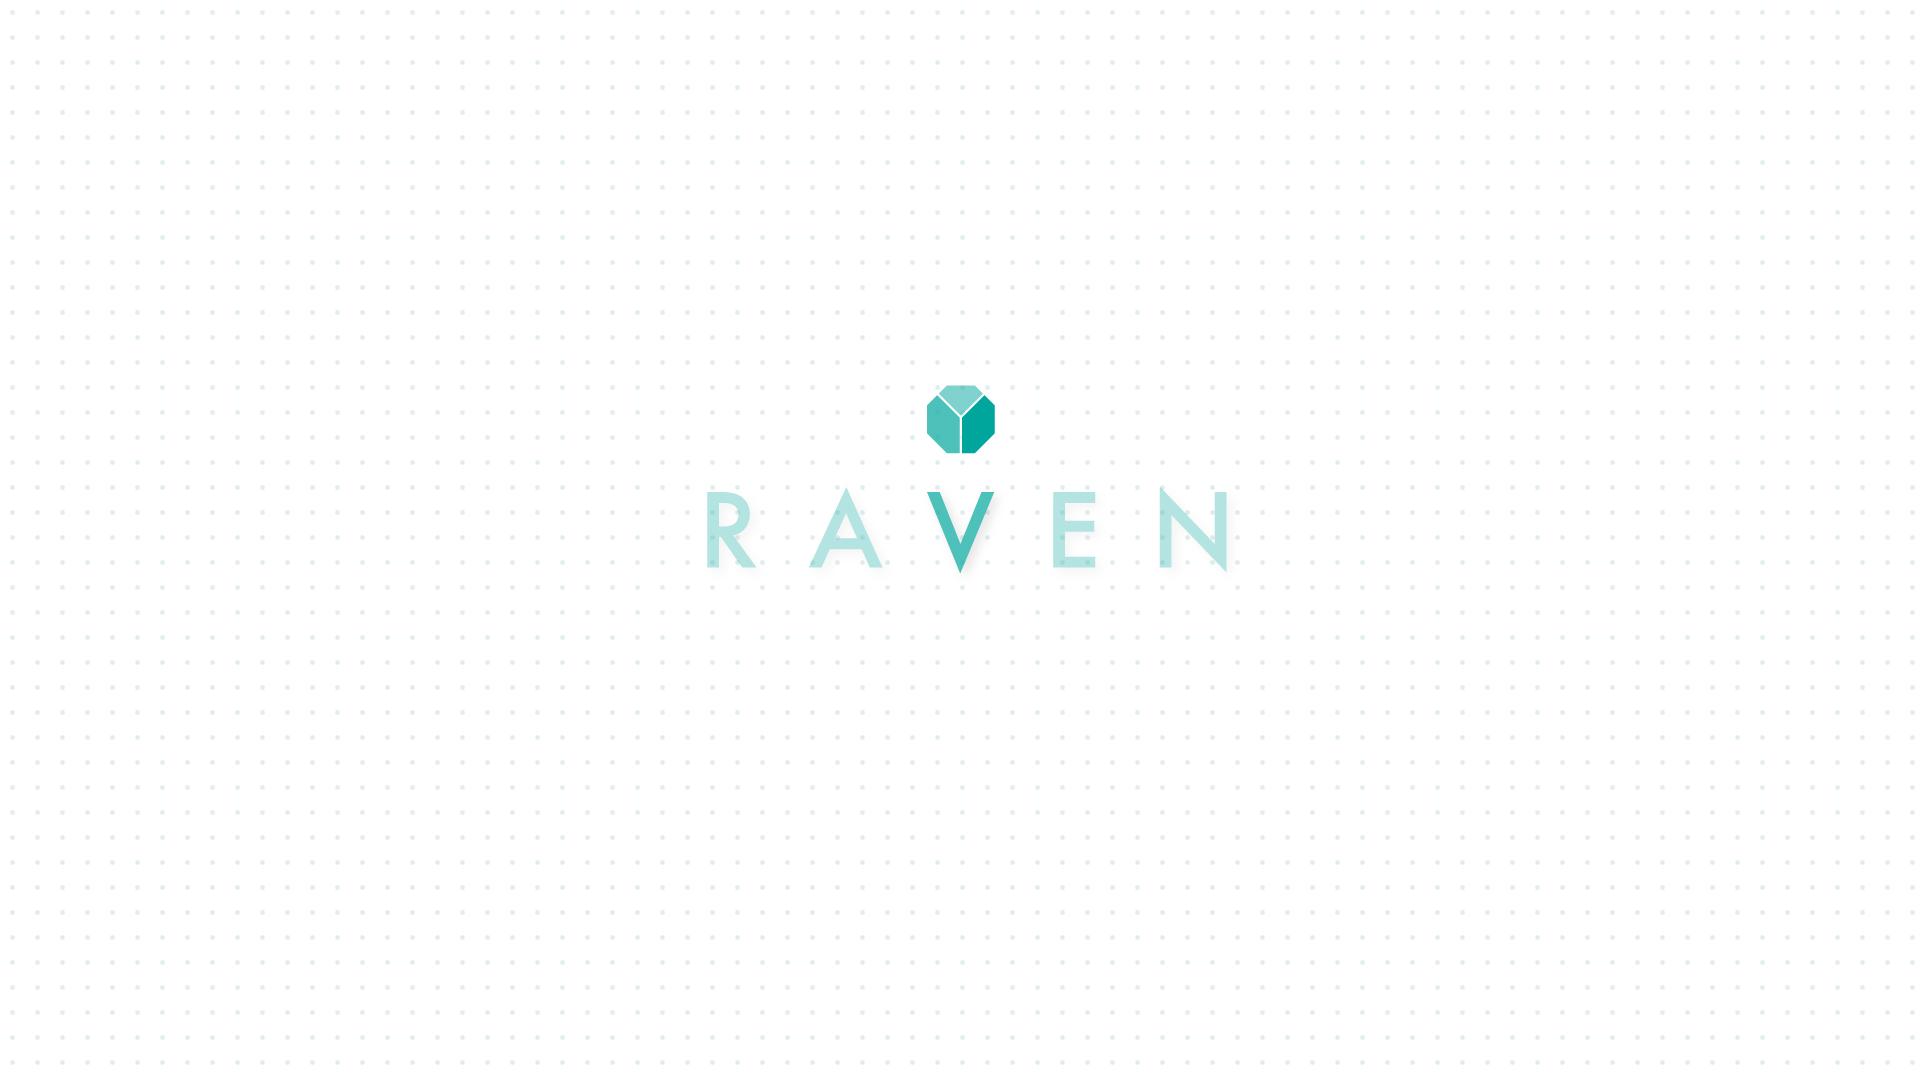 RAVEN_03.1-01.jpg